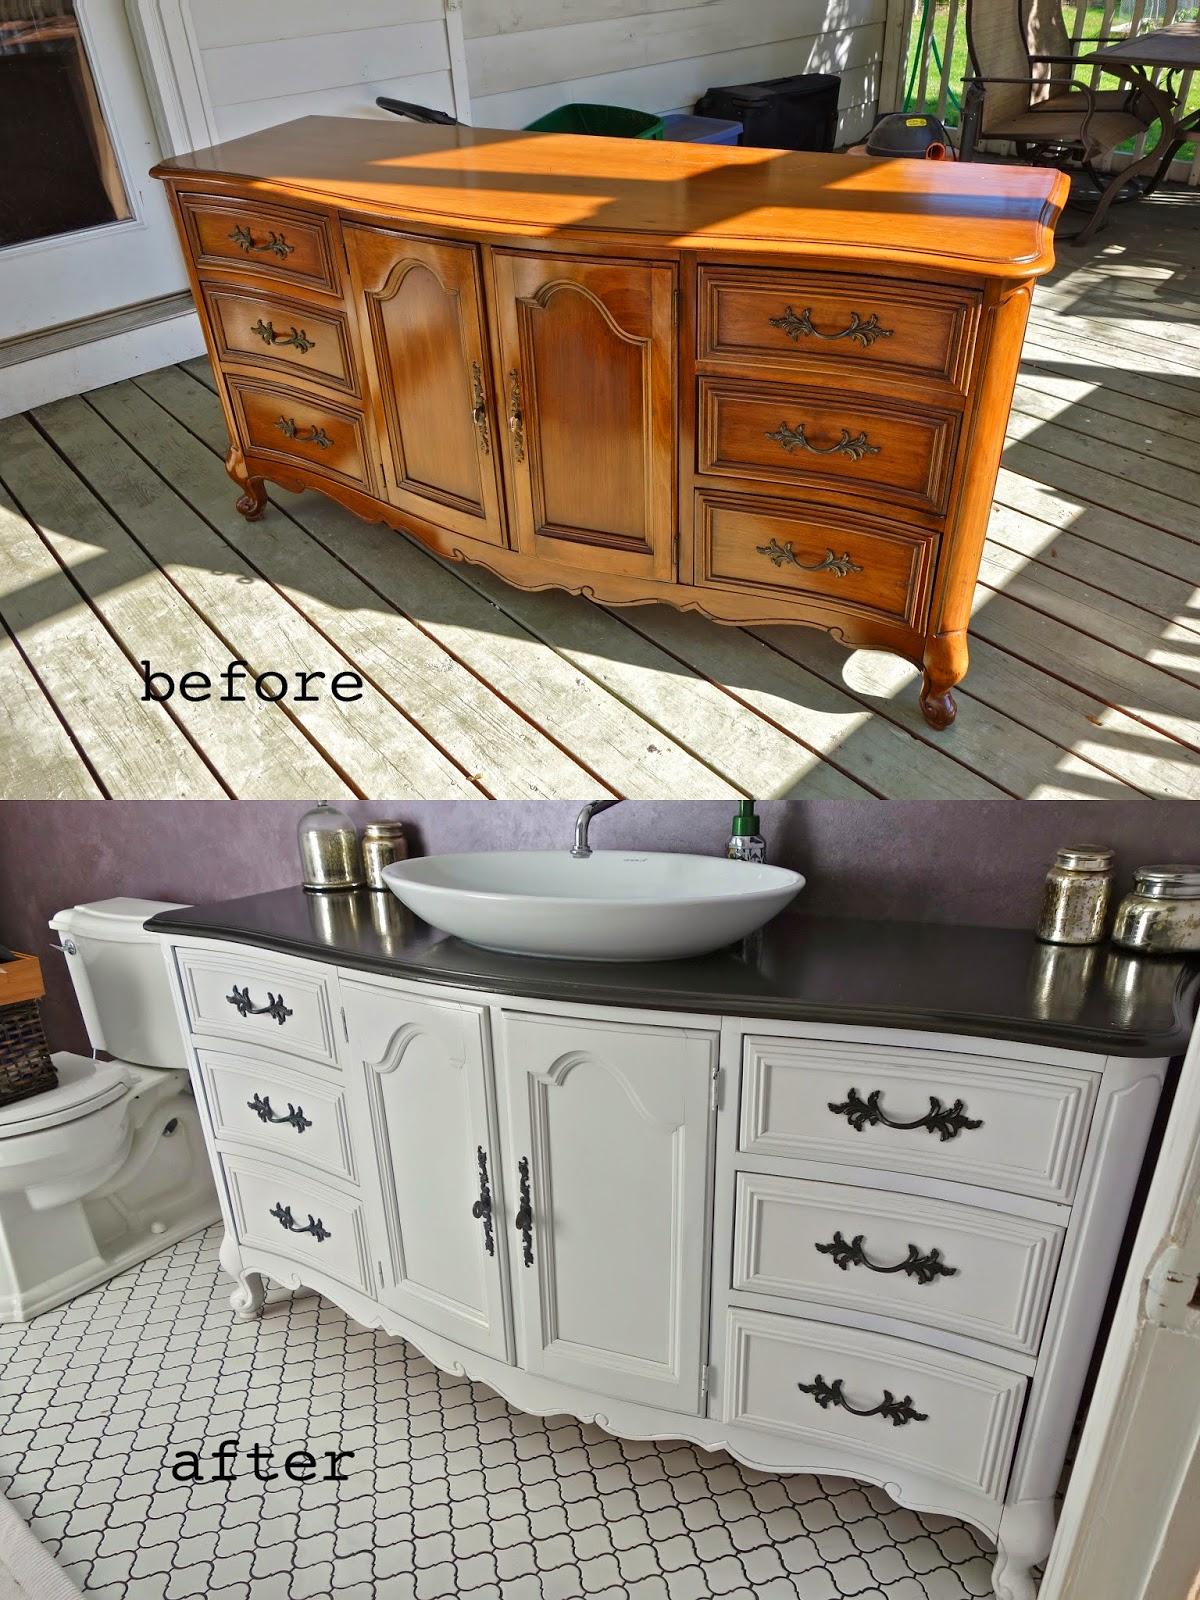 rustyfarmhouse DIY  Repurposing a Buffet or Dresser as a